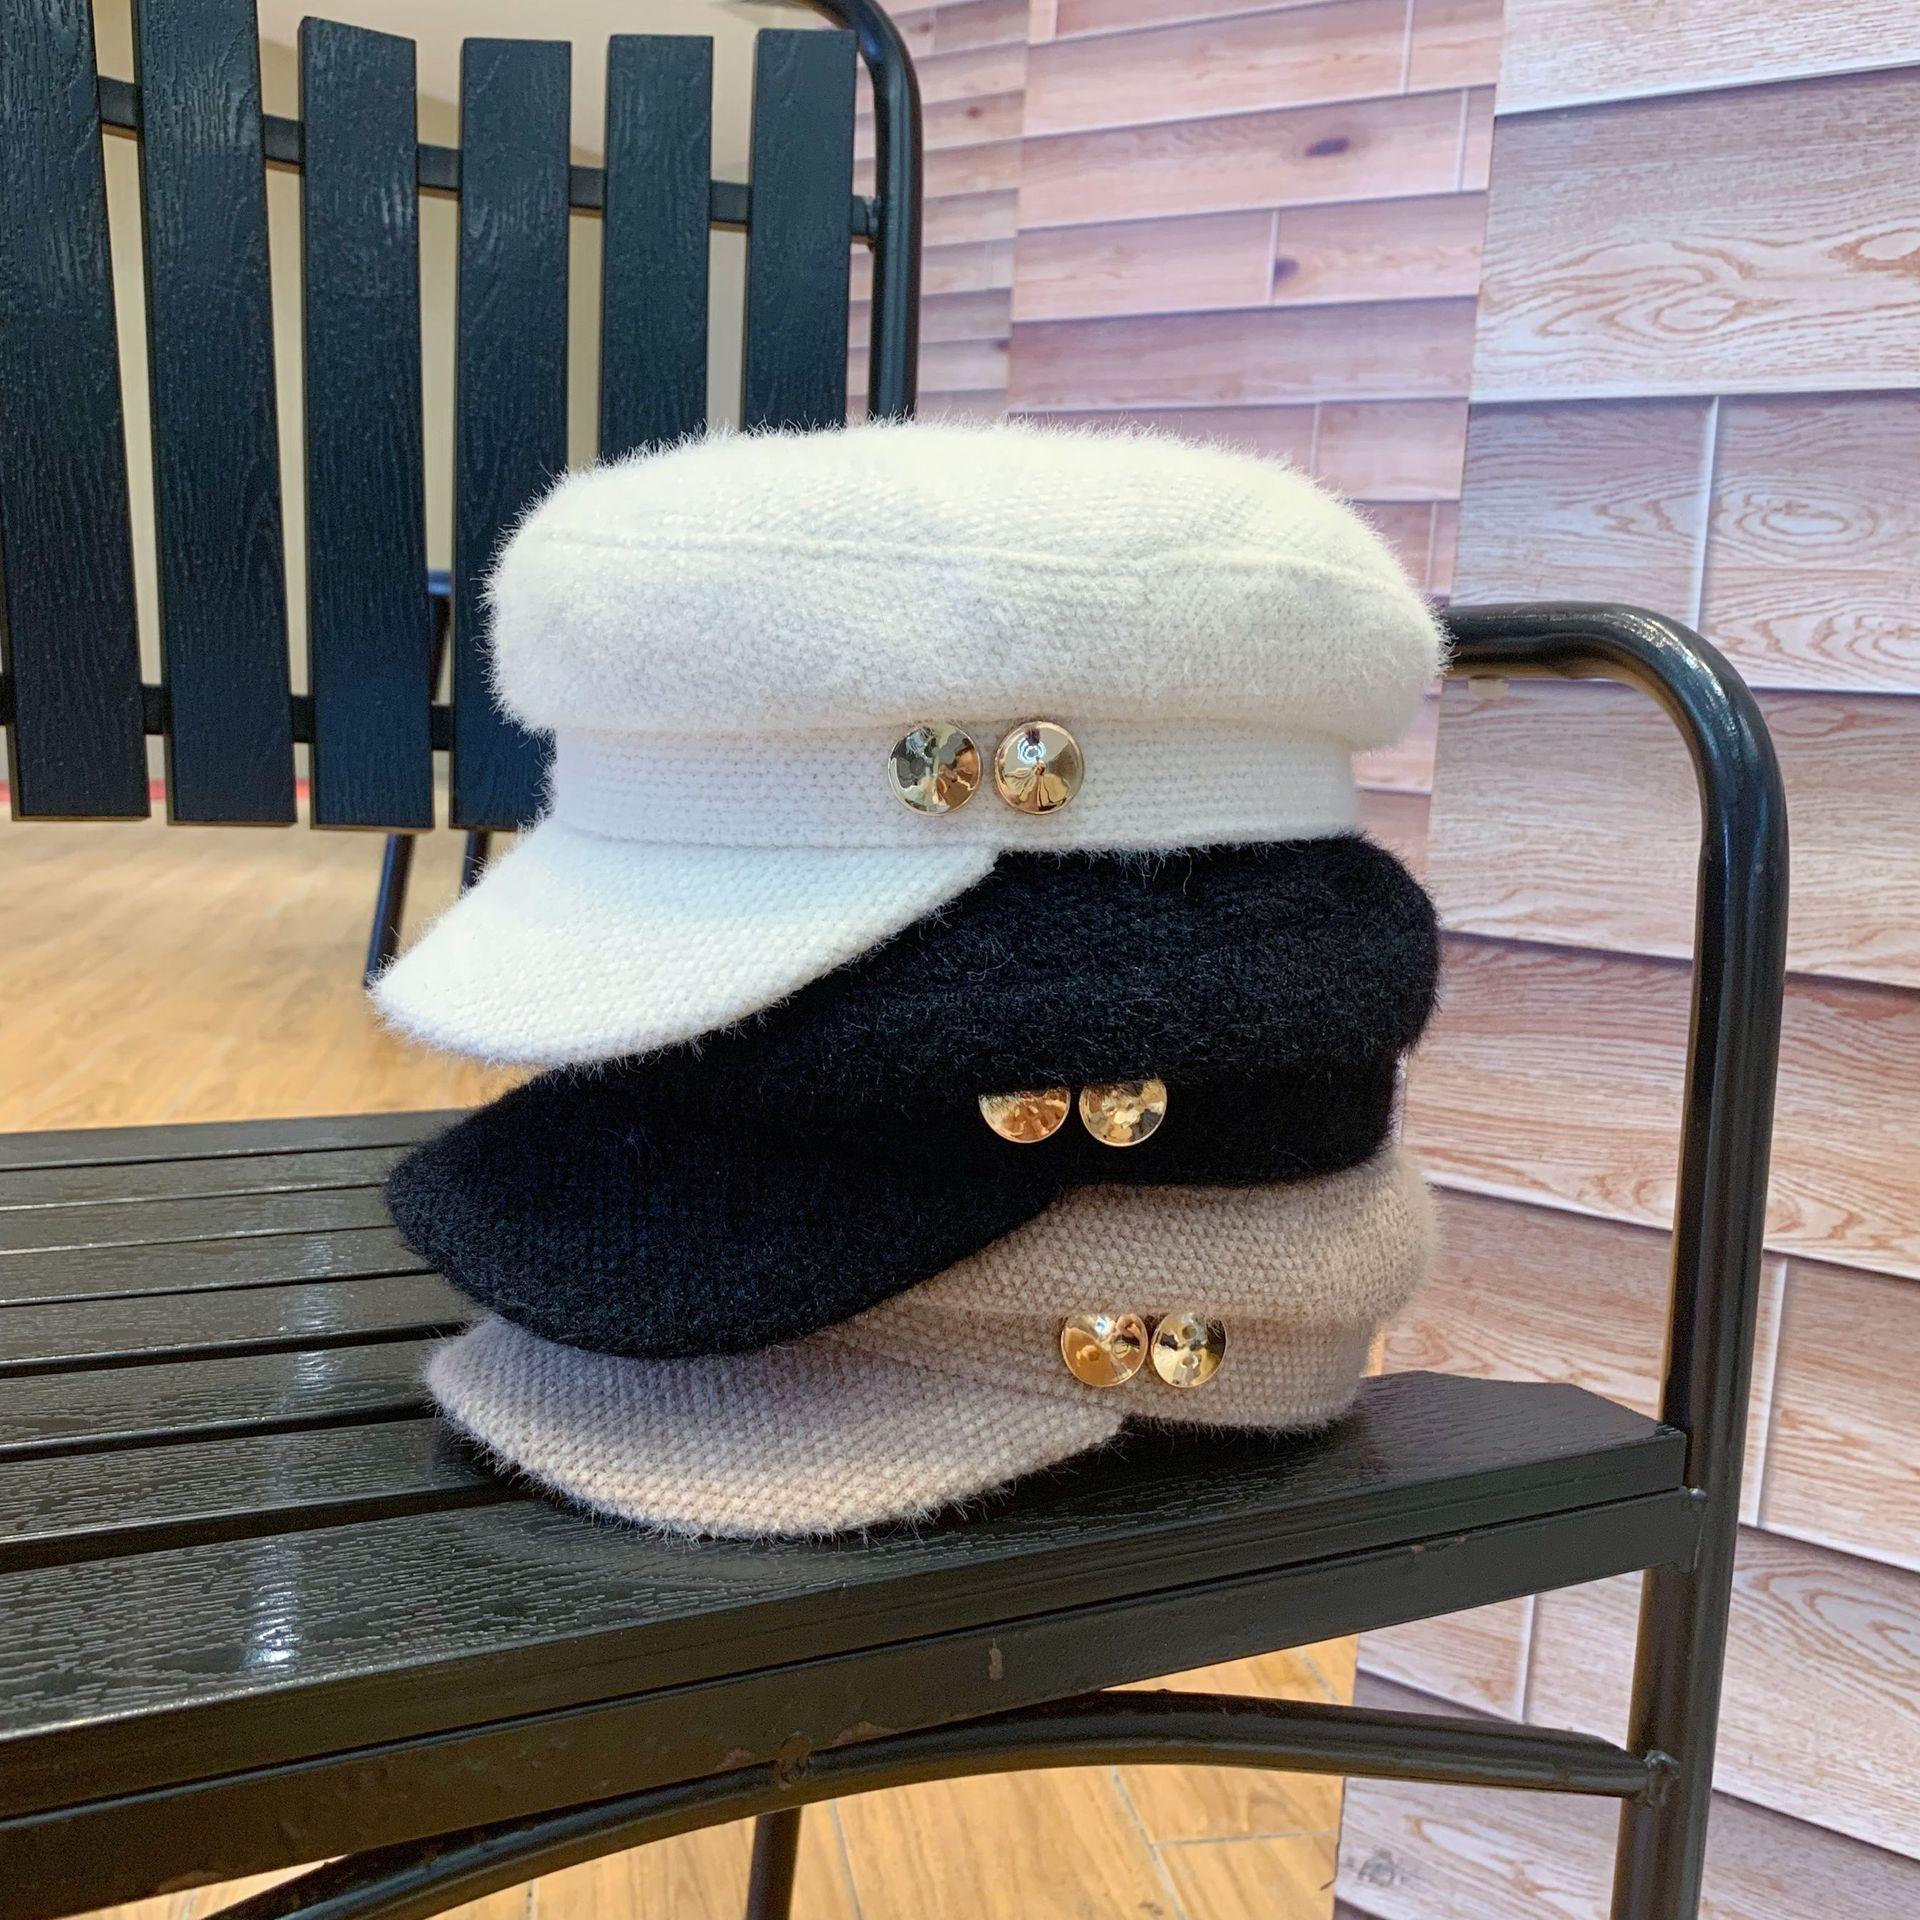 01909-yuchun882285365  Metal buttons winter warm octagonal hat men women leisure visors cap wholesale